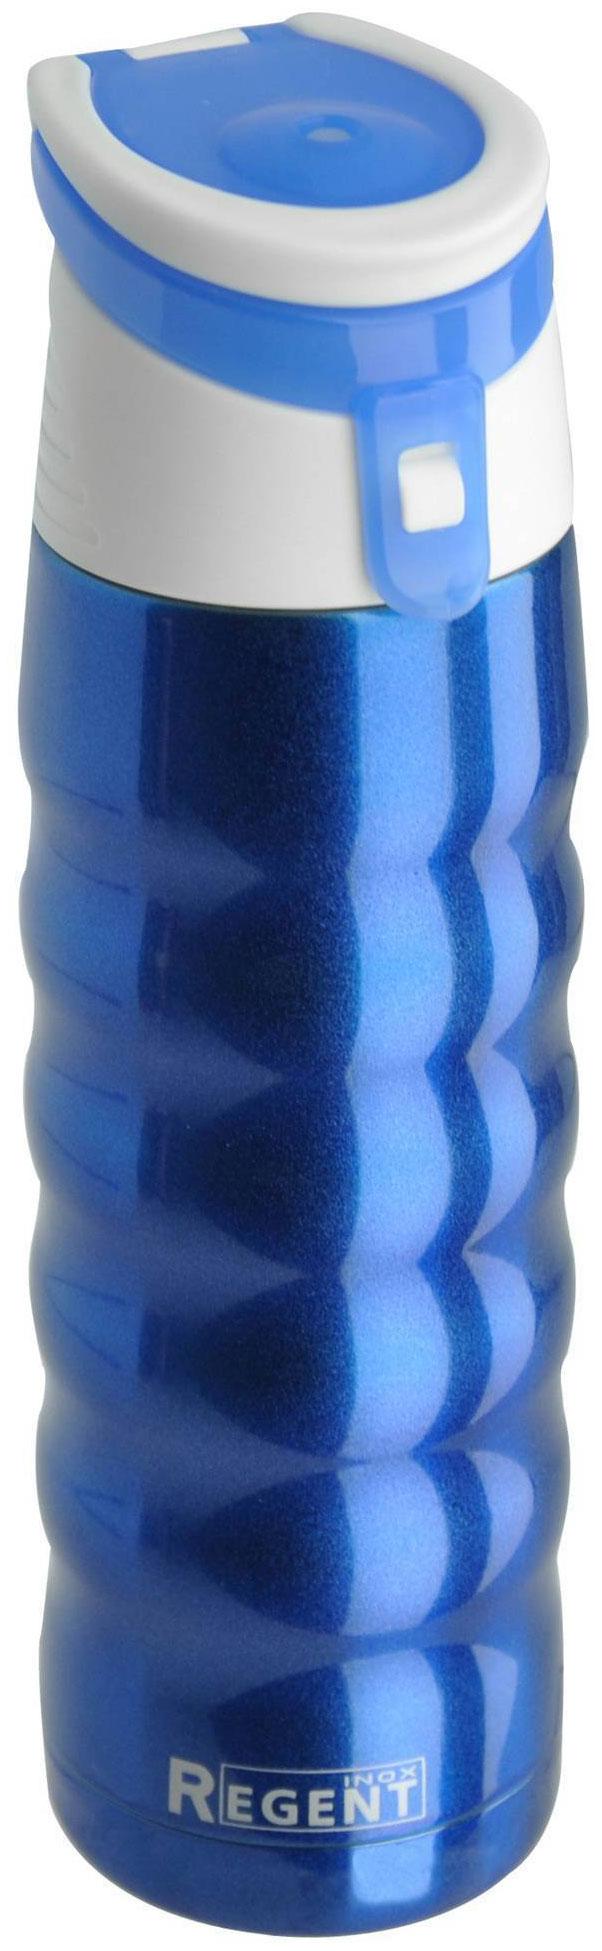 Термос Regent Fitness 0,48 л синий